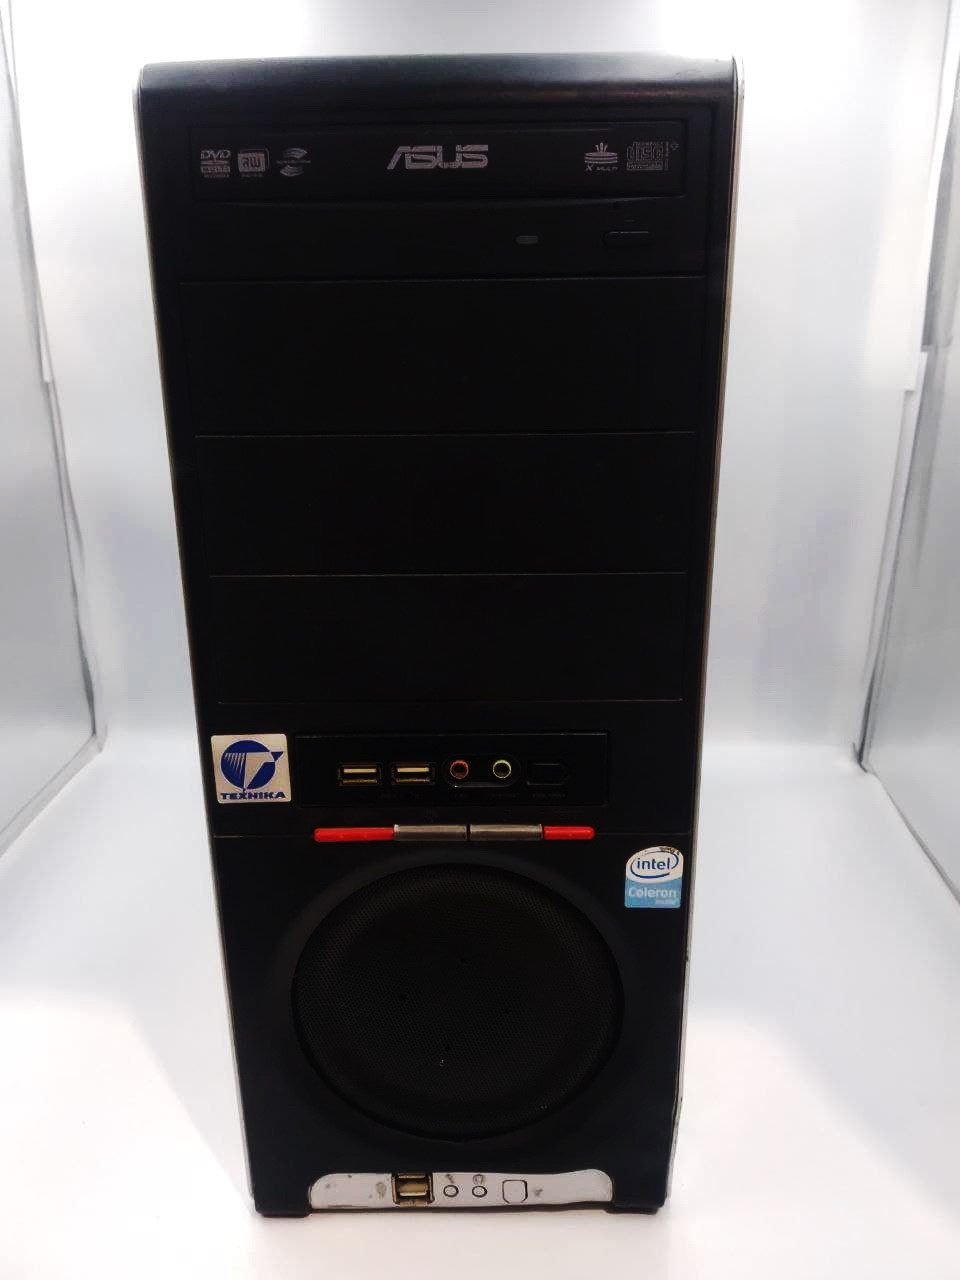 Системный блок Vento (Intel Pentium E5700 / 3Gb / 500 Gb / GT 730) (1301) - Б/У